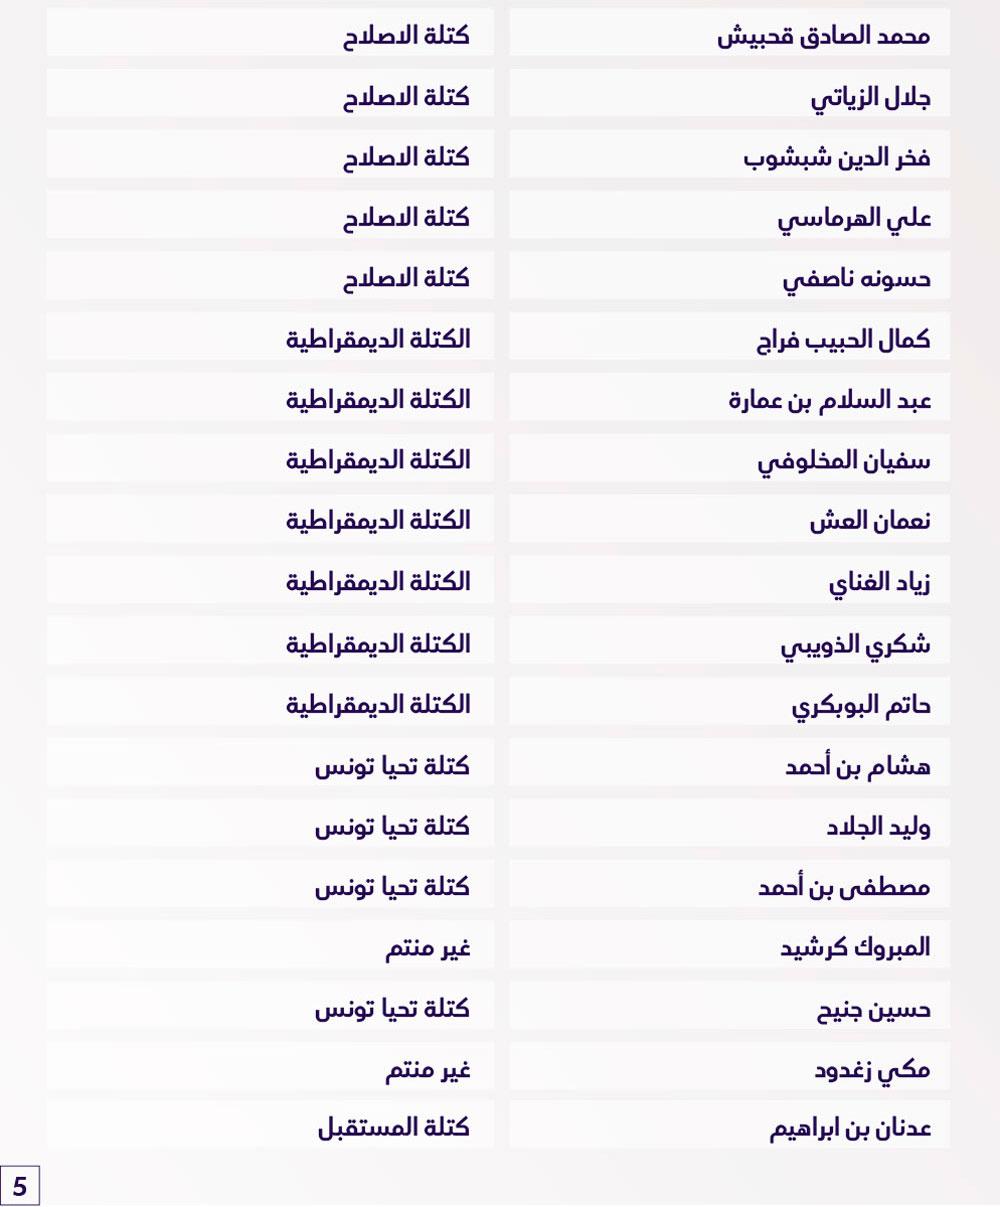 vote-bawsala-300720--5.jpg